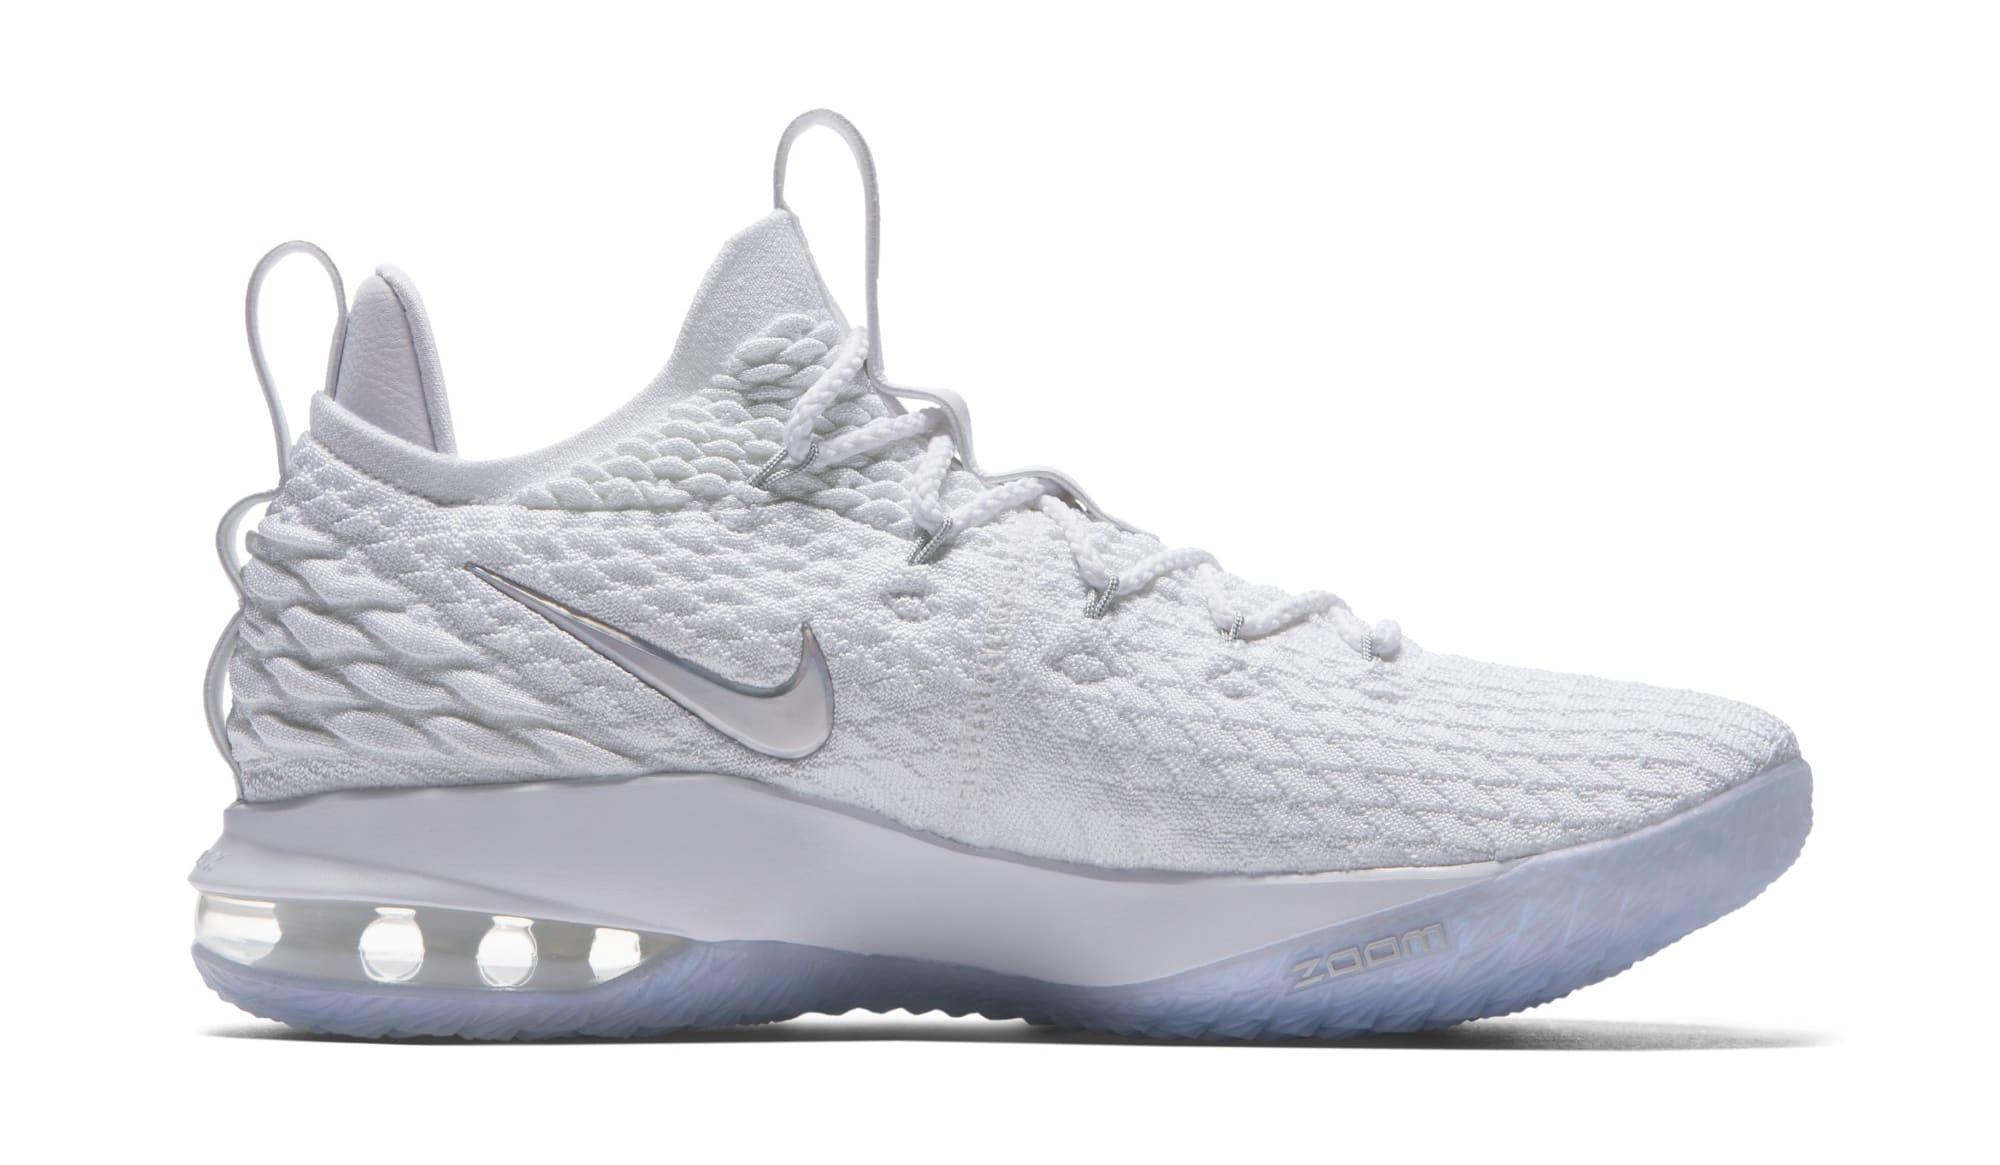 Nike LeBron 15 Low 'White' AO1755-100 (Medial)